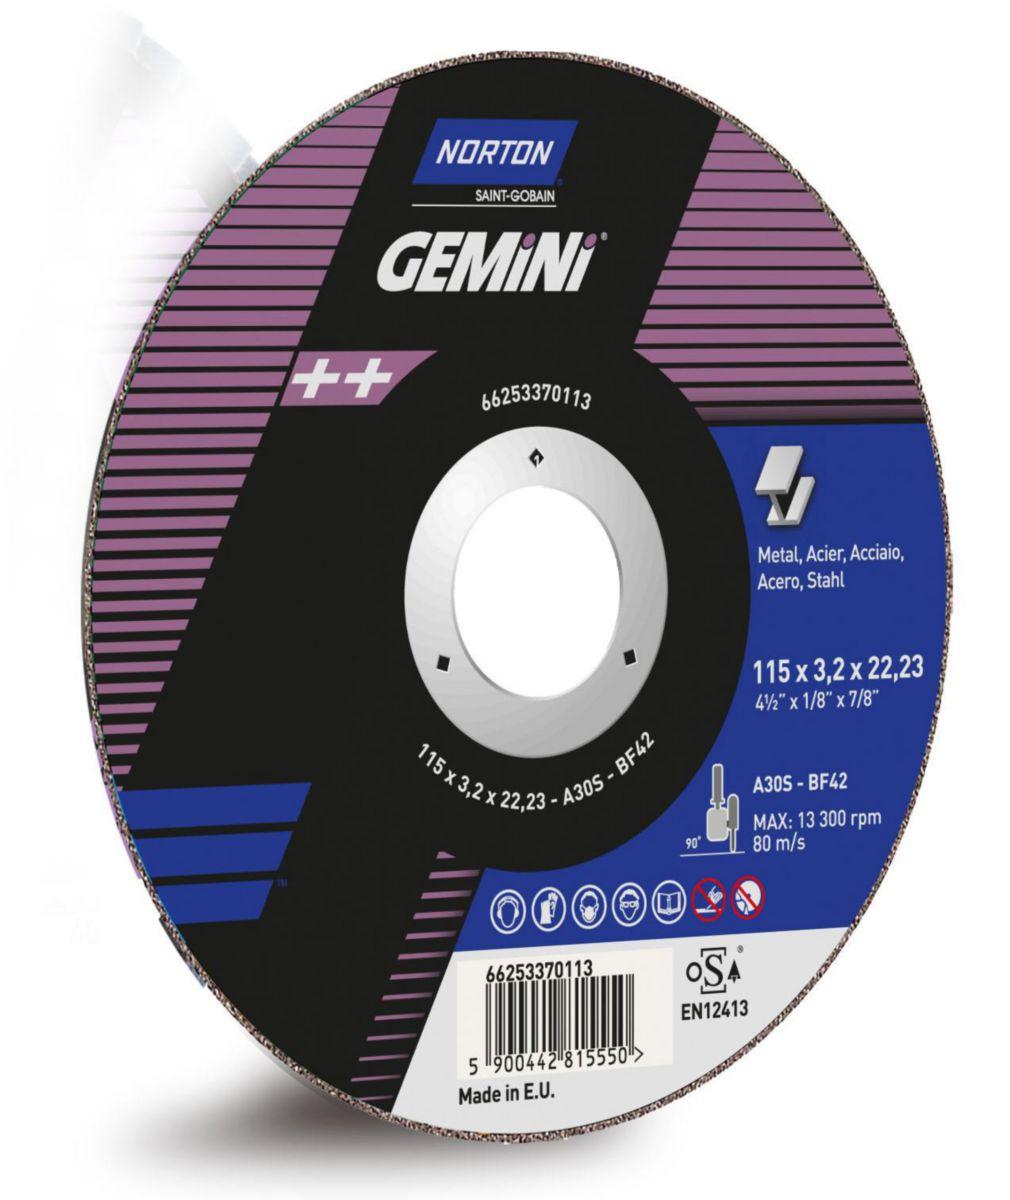 Disque à tronconner 125X1.6X22.23 Gemini inox Réf. 66253370107